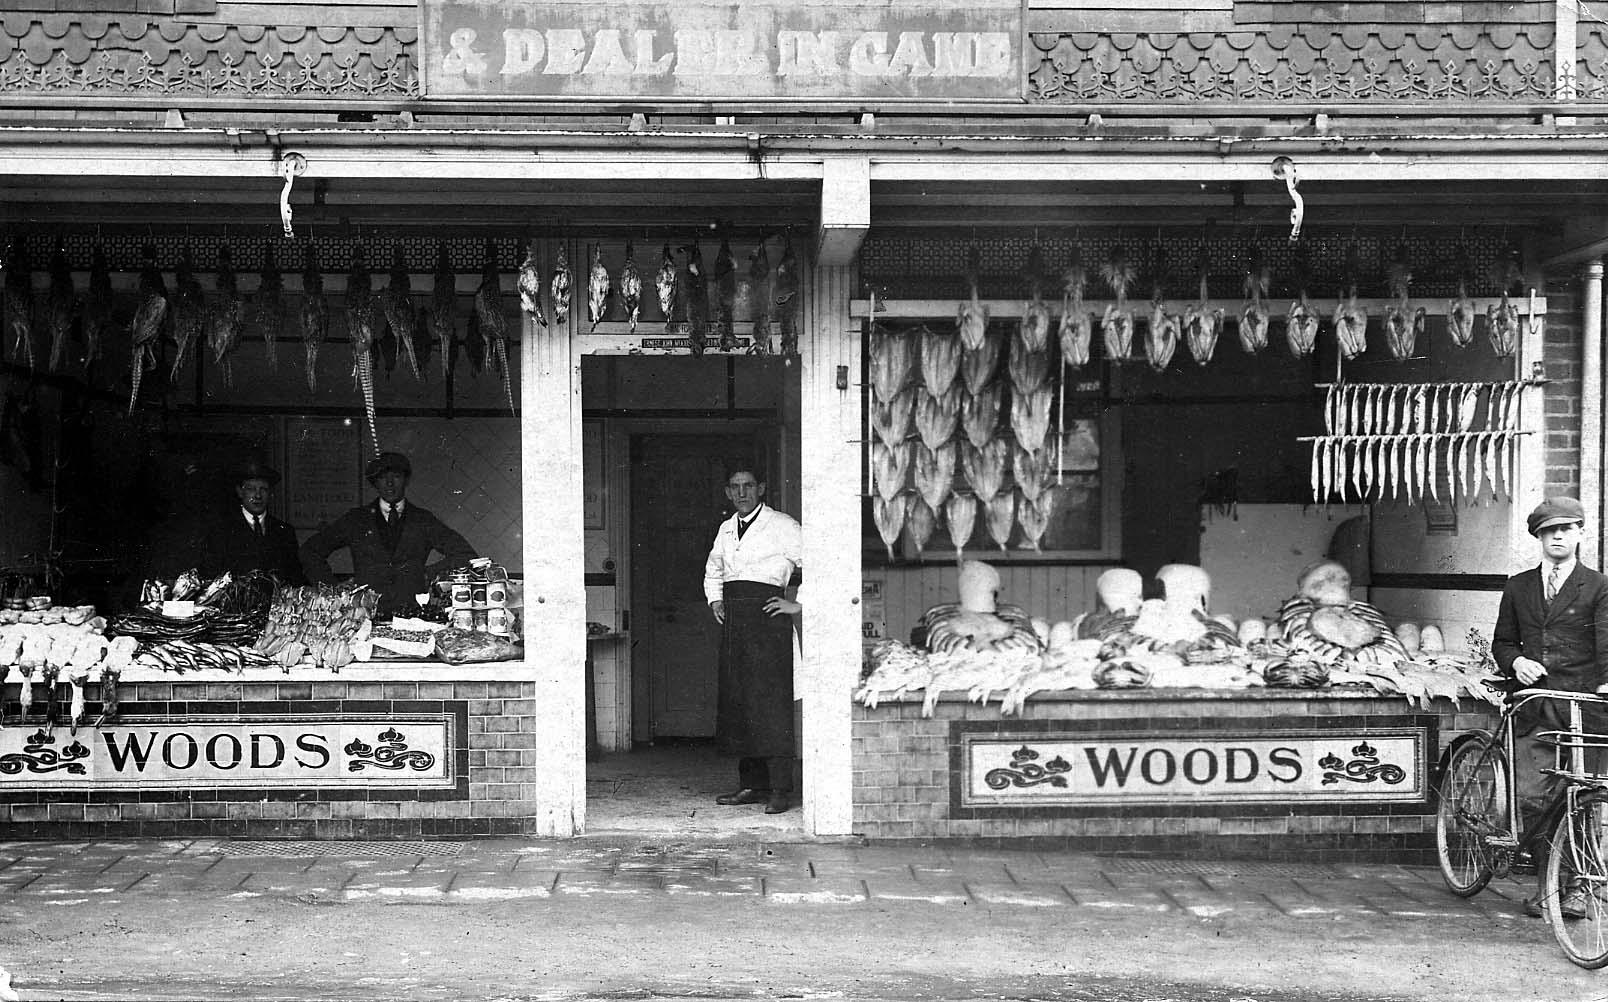 Woods Original Shop Front comp